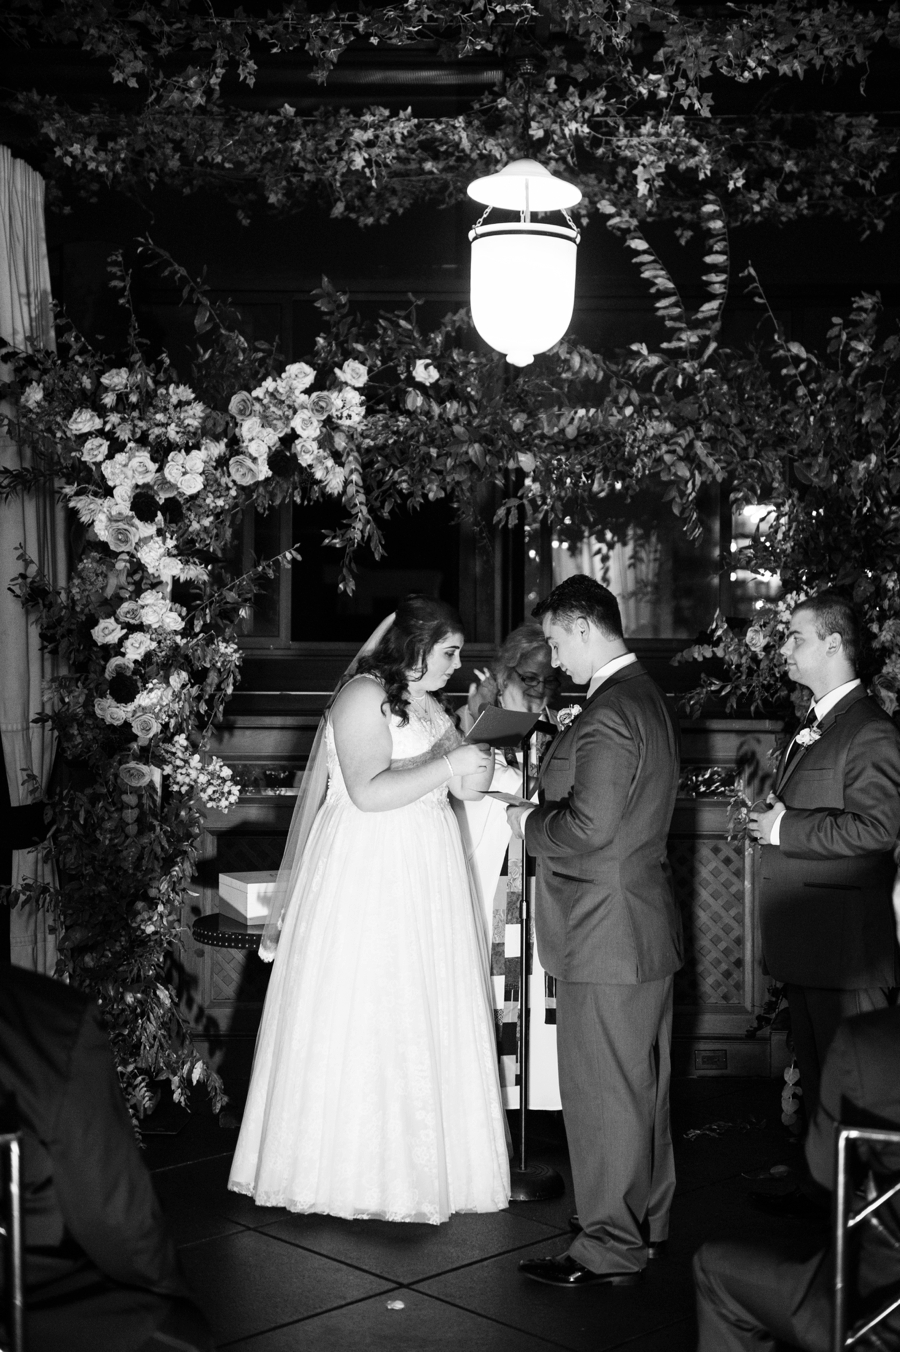 Gramercy_Park_Hotel_NYC_Wedding_AK_028.jpg